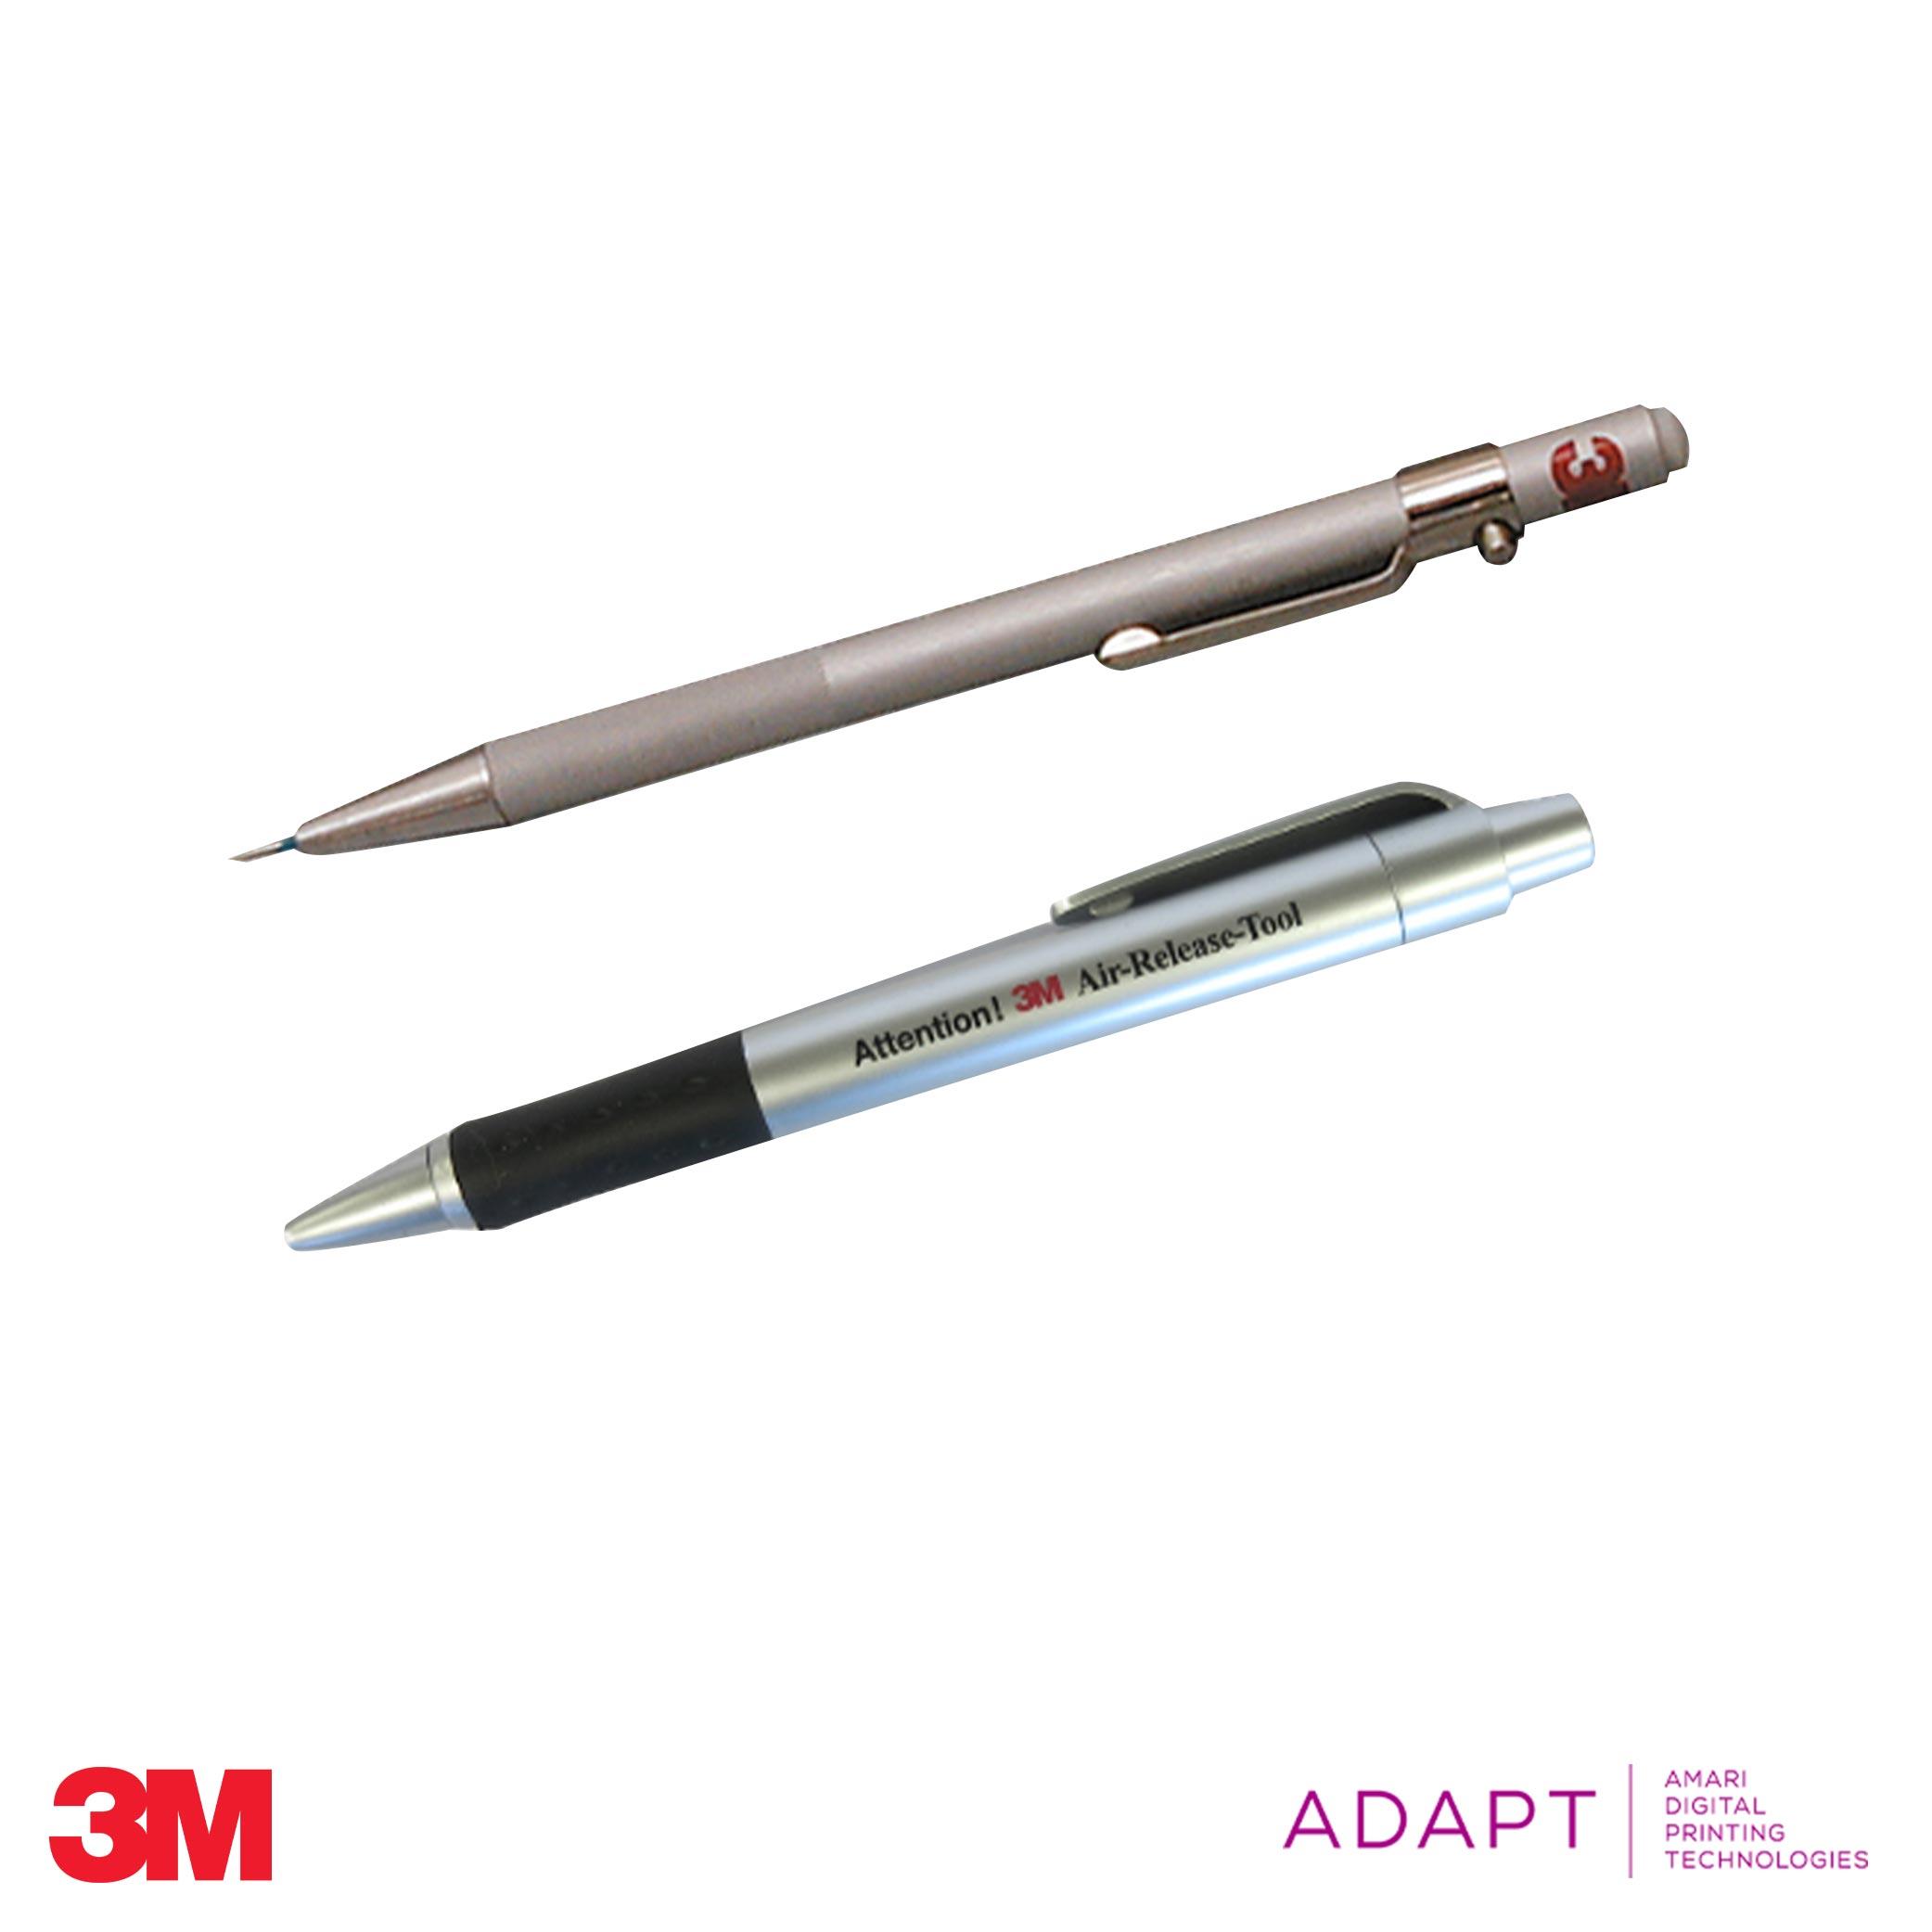 3M General Tools